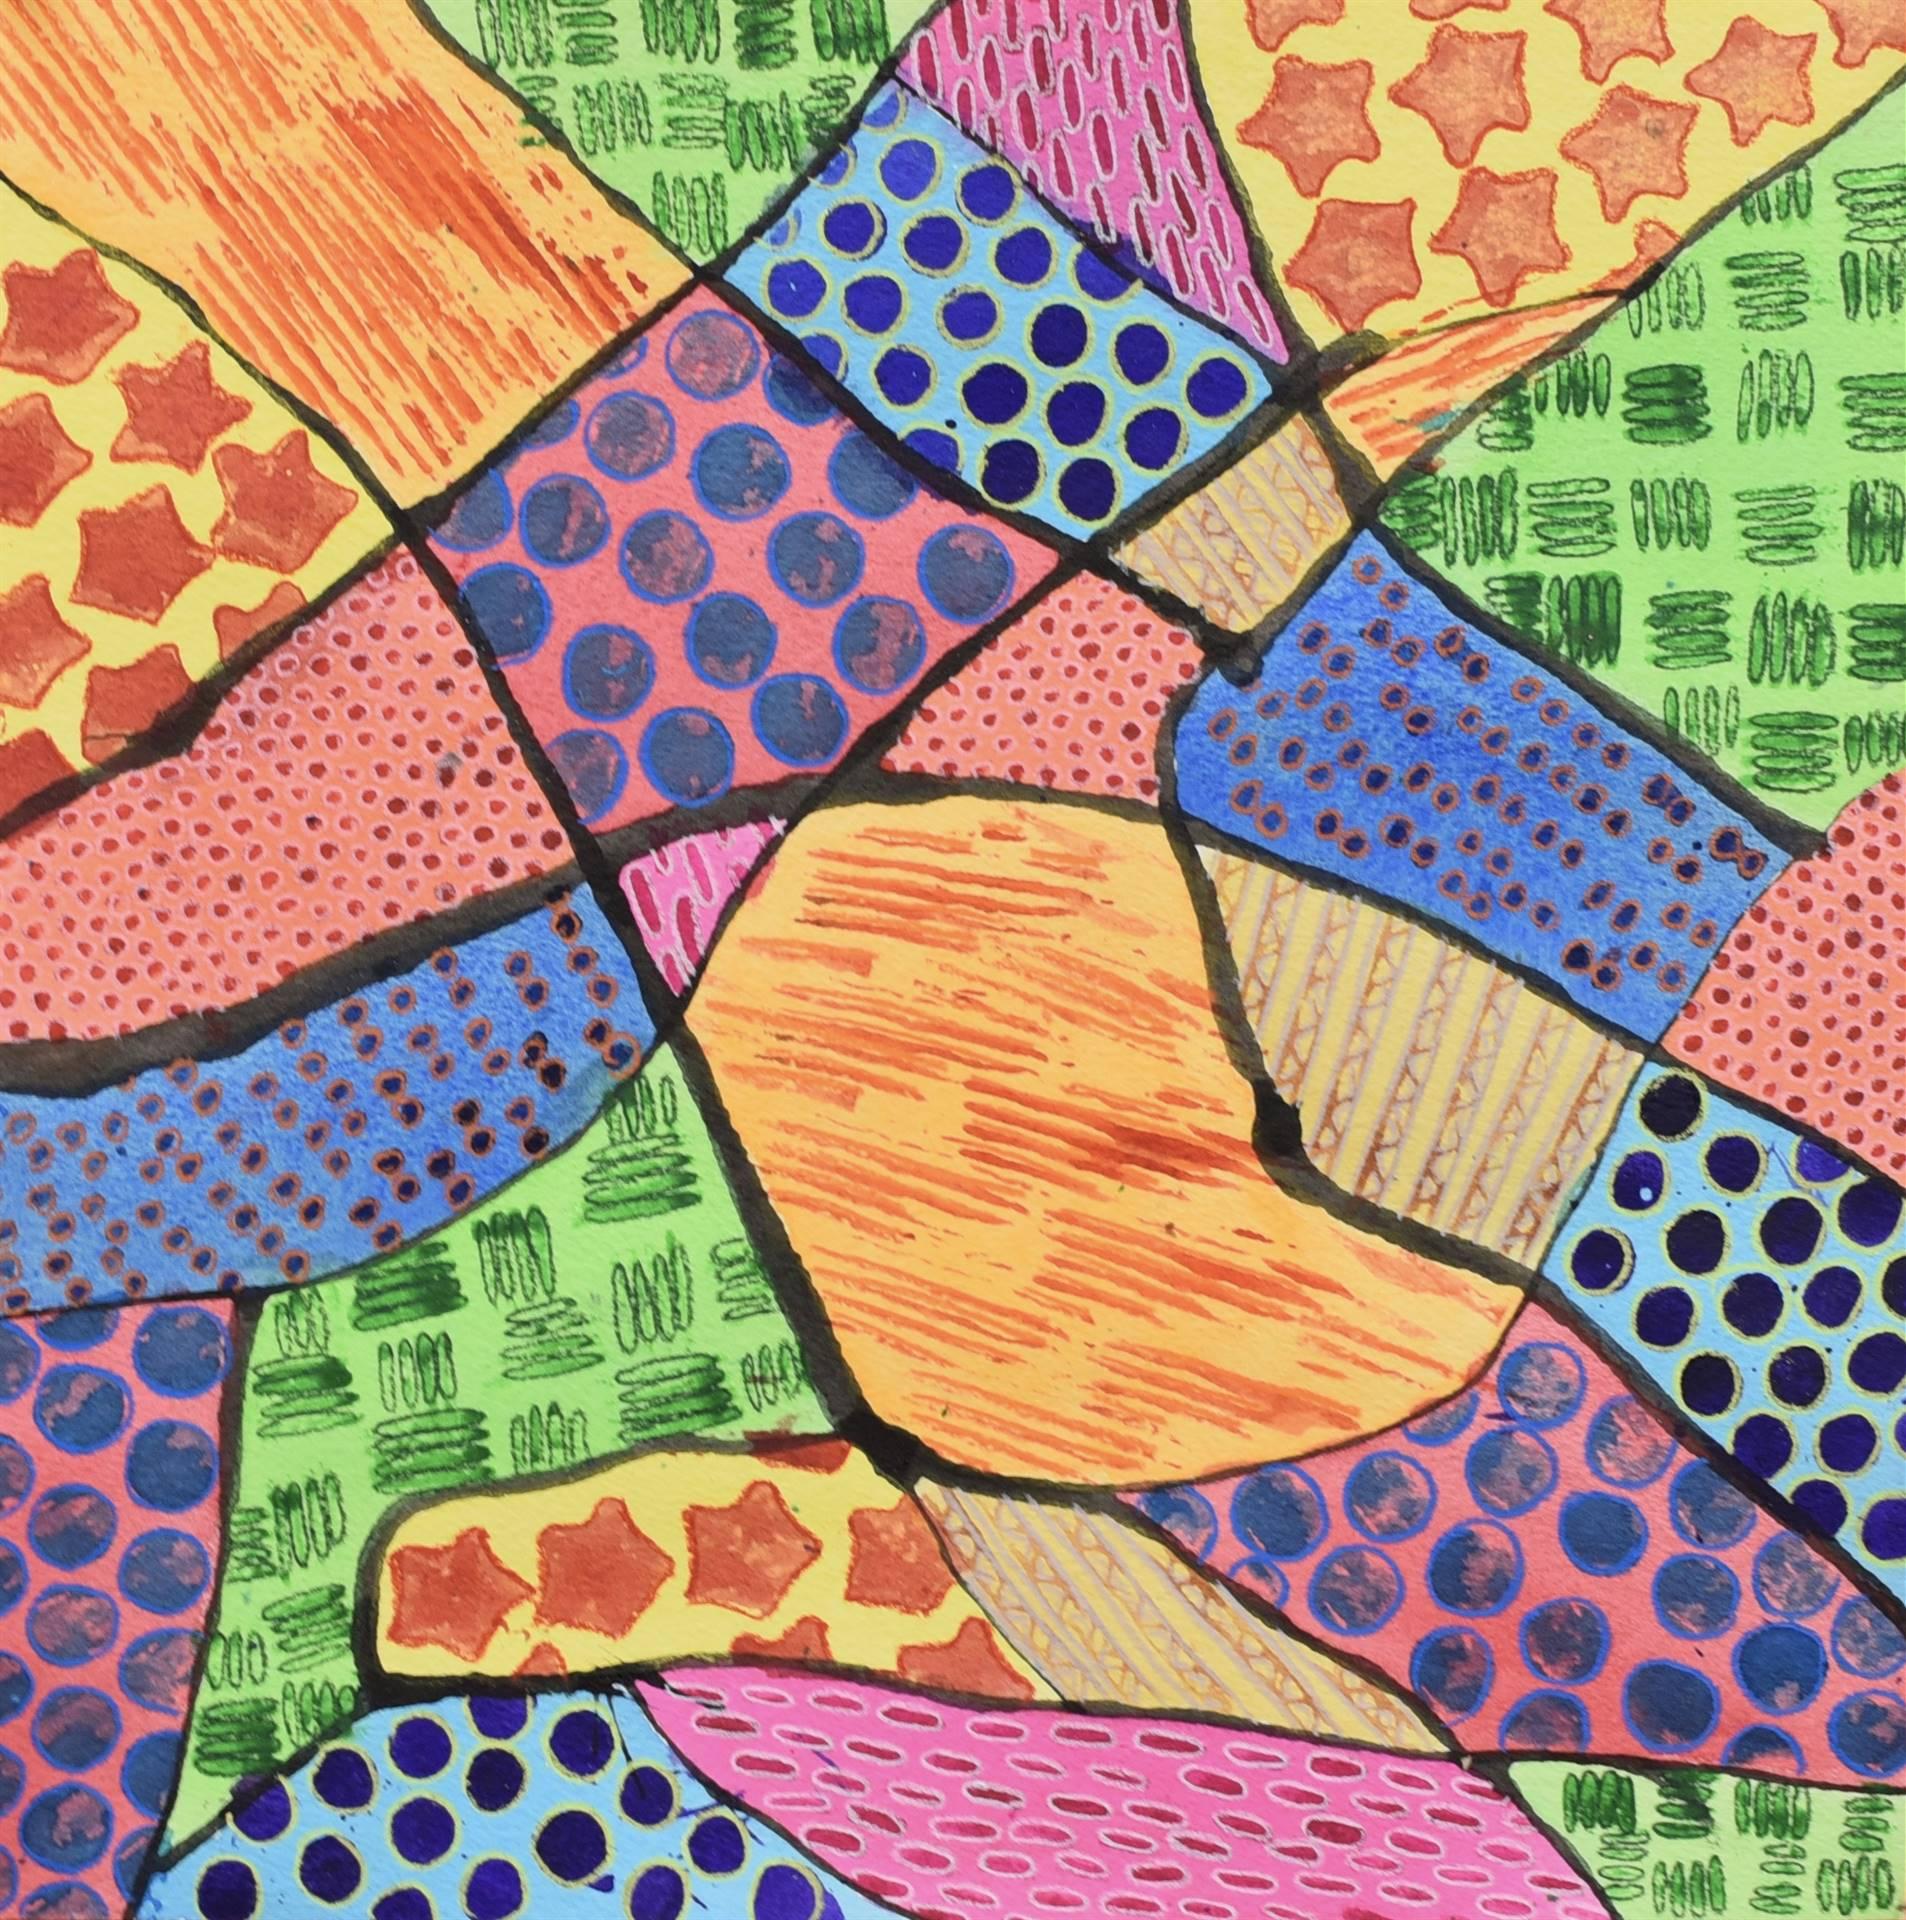 Brecksville-Broadview Hts. Middle School Art Projects 47